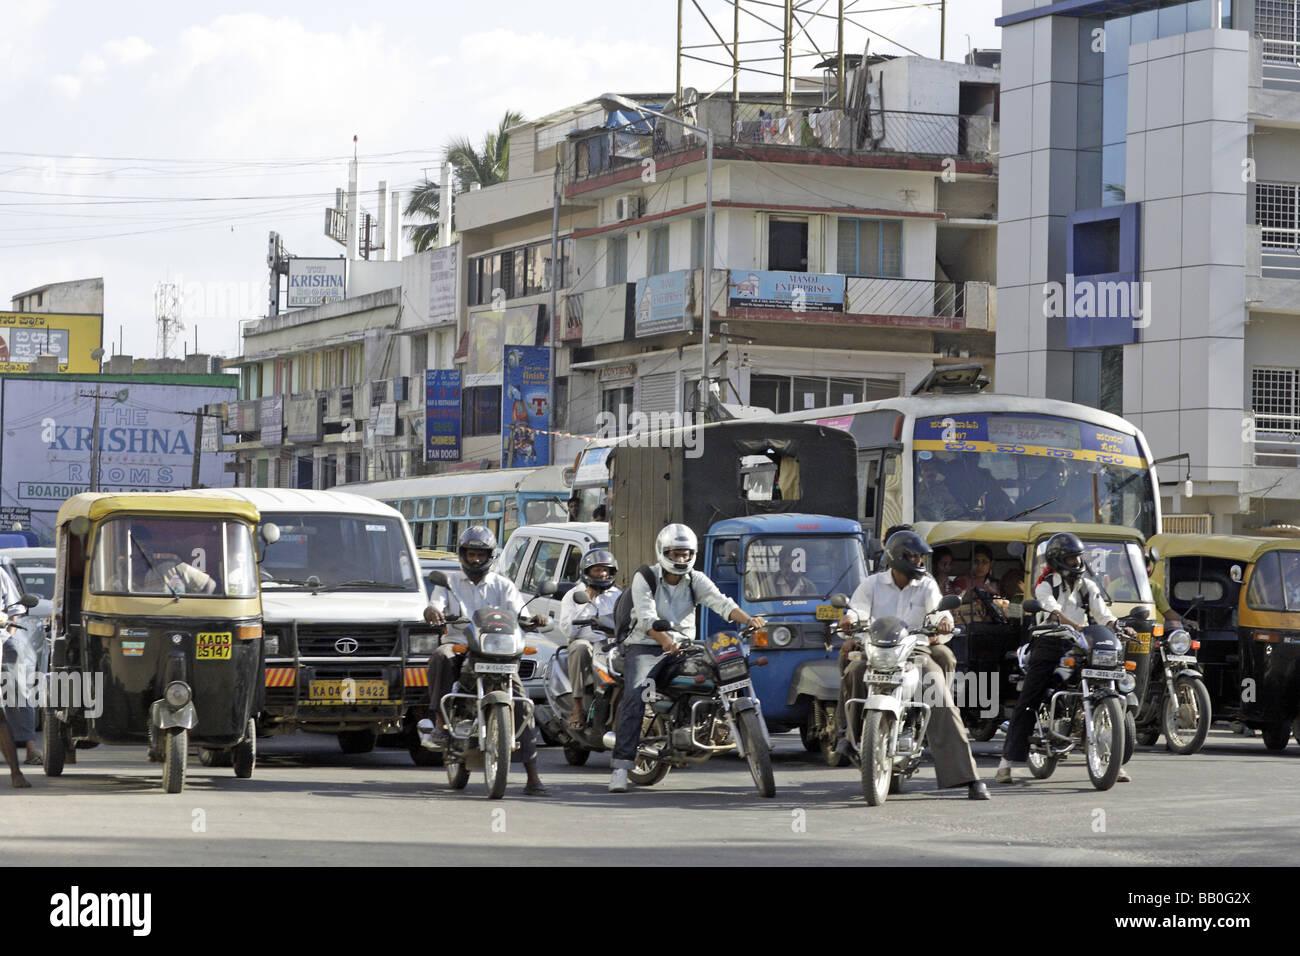 Straße Landschaft Bangalore Indien Stockbild